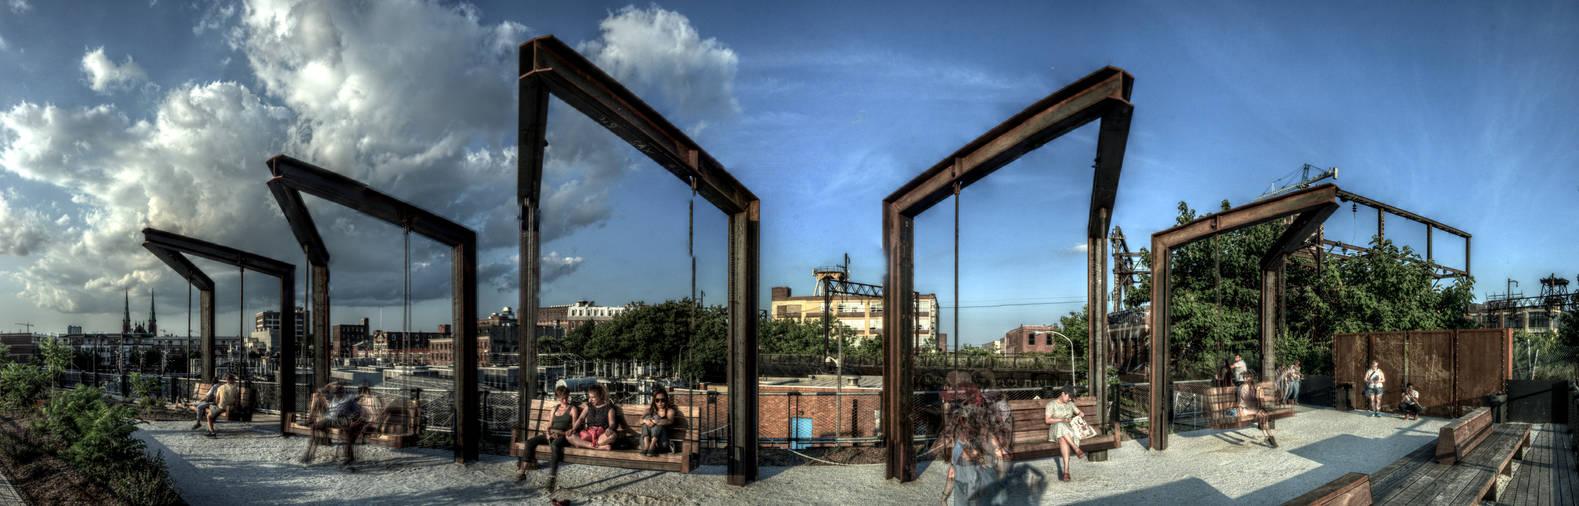 Panorama 3679 hdr pregamma 1 mantiuk06 contrast ma by bruhinb